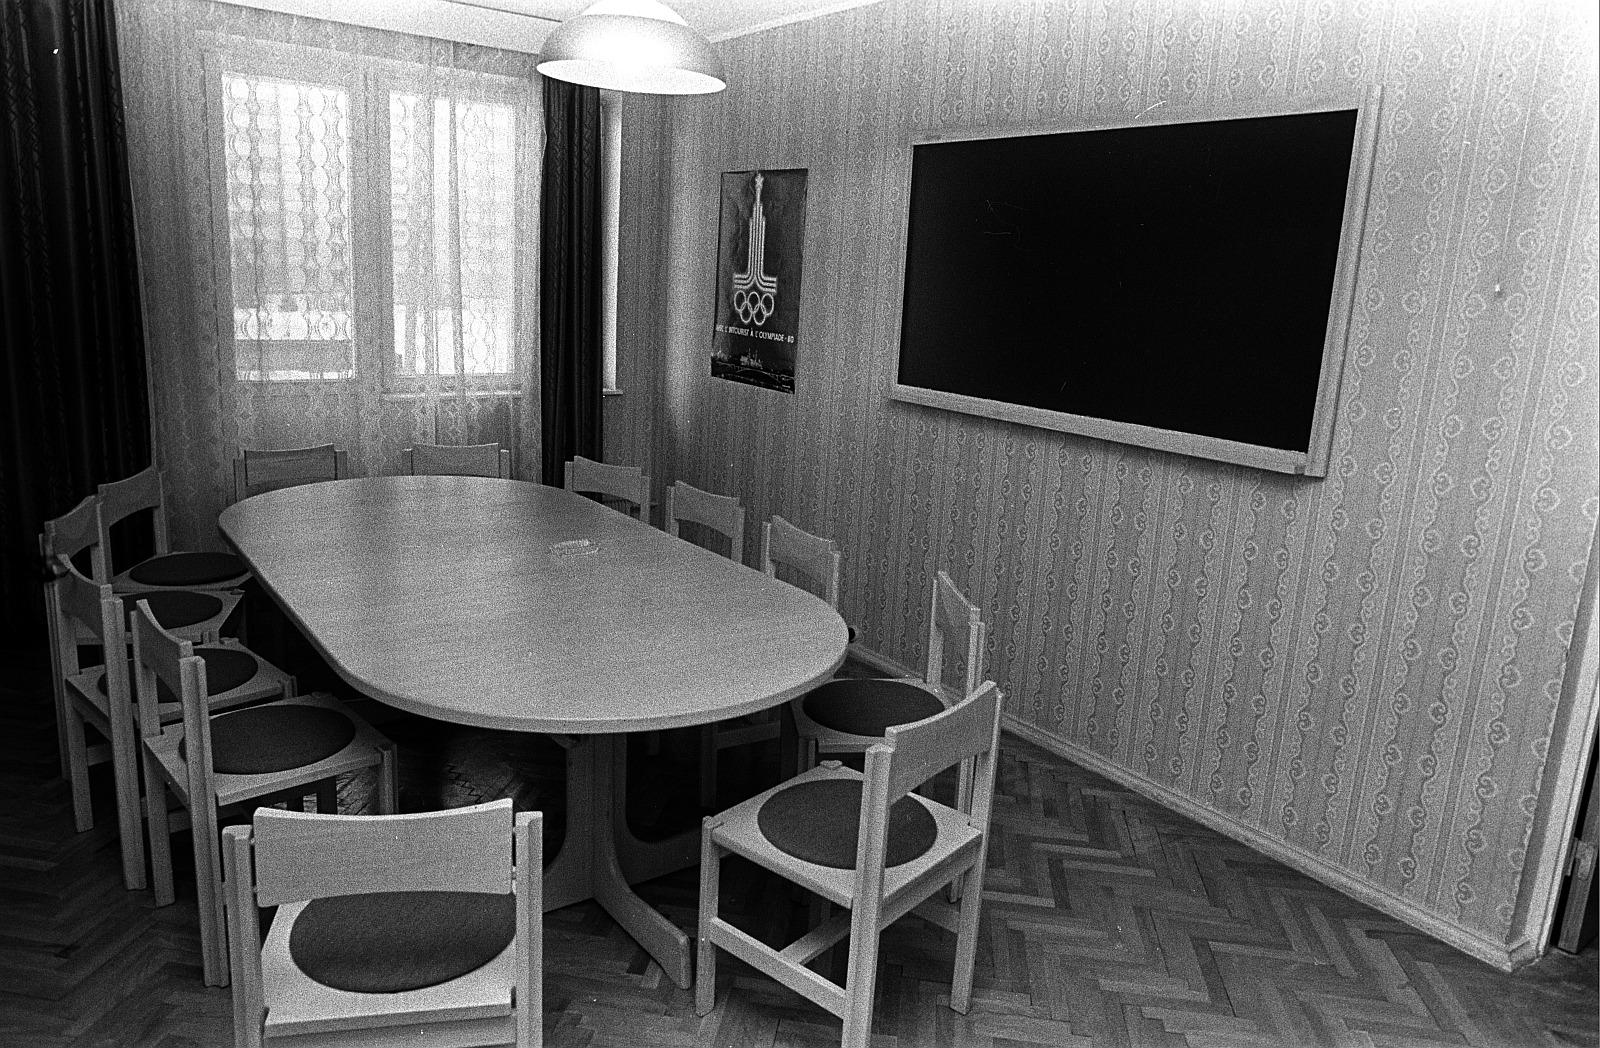 Гостиница «Салют». Зал заседаний